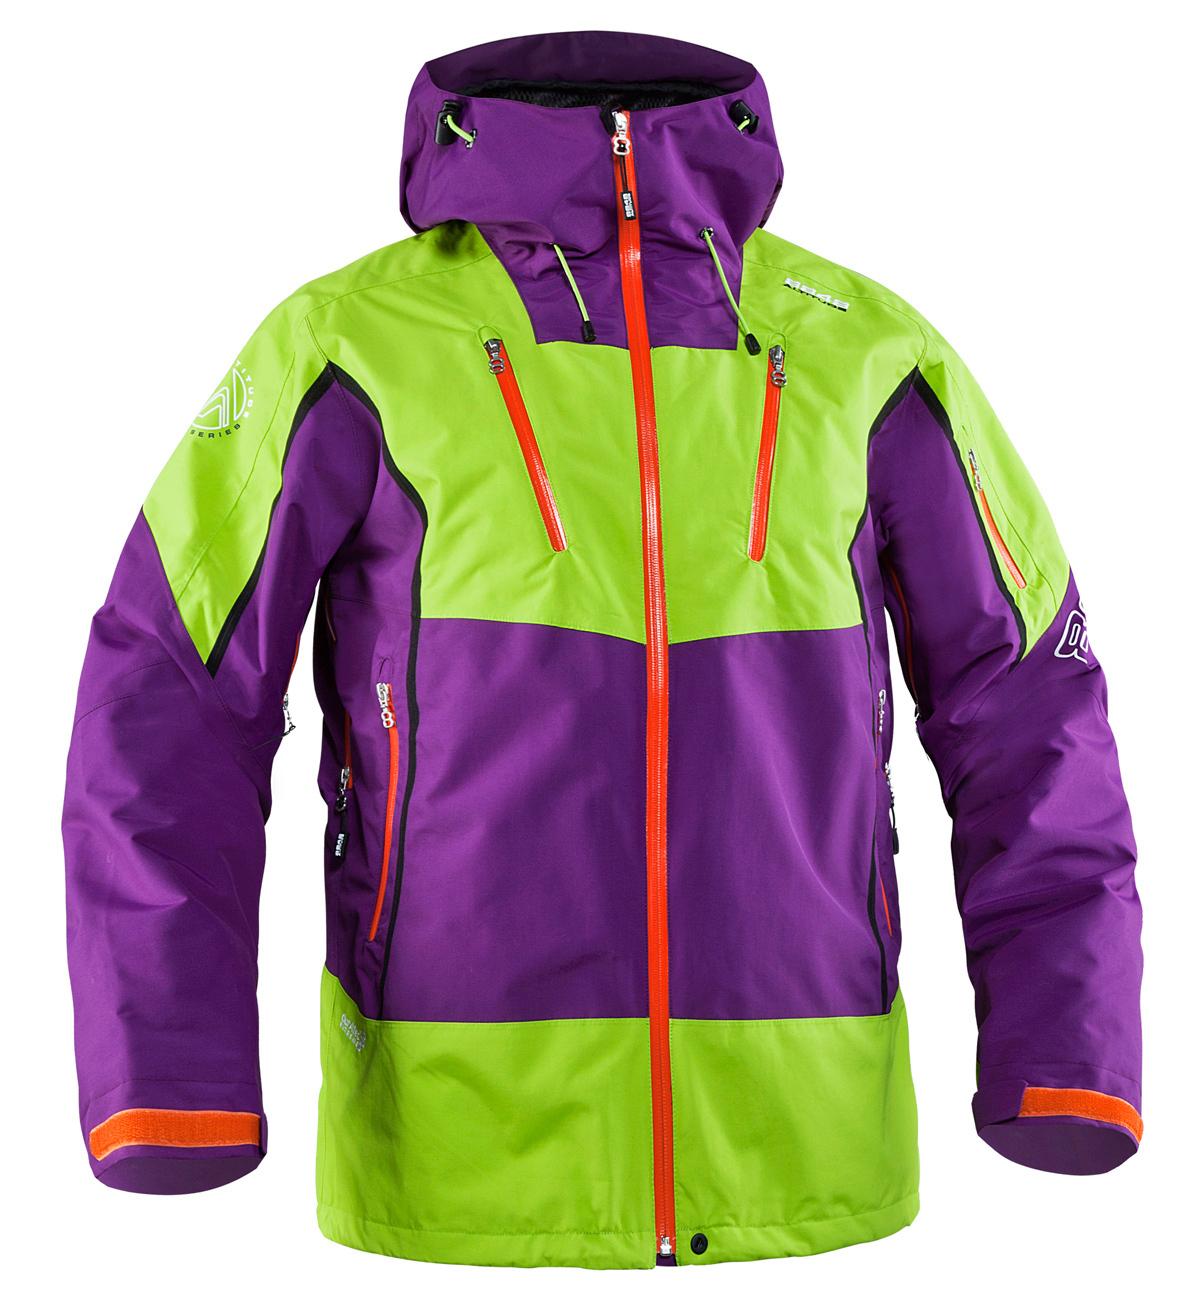 Горнолыжная куртка 8848 Altitude «CURBS»